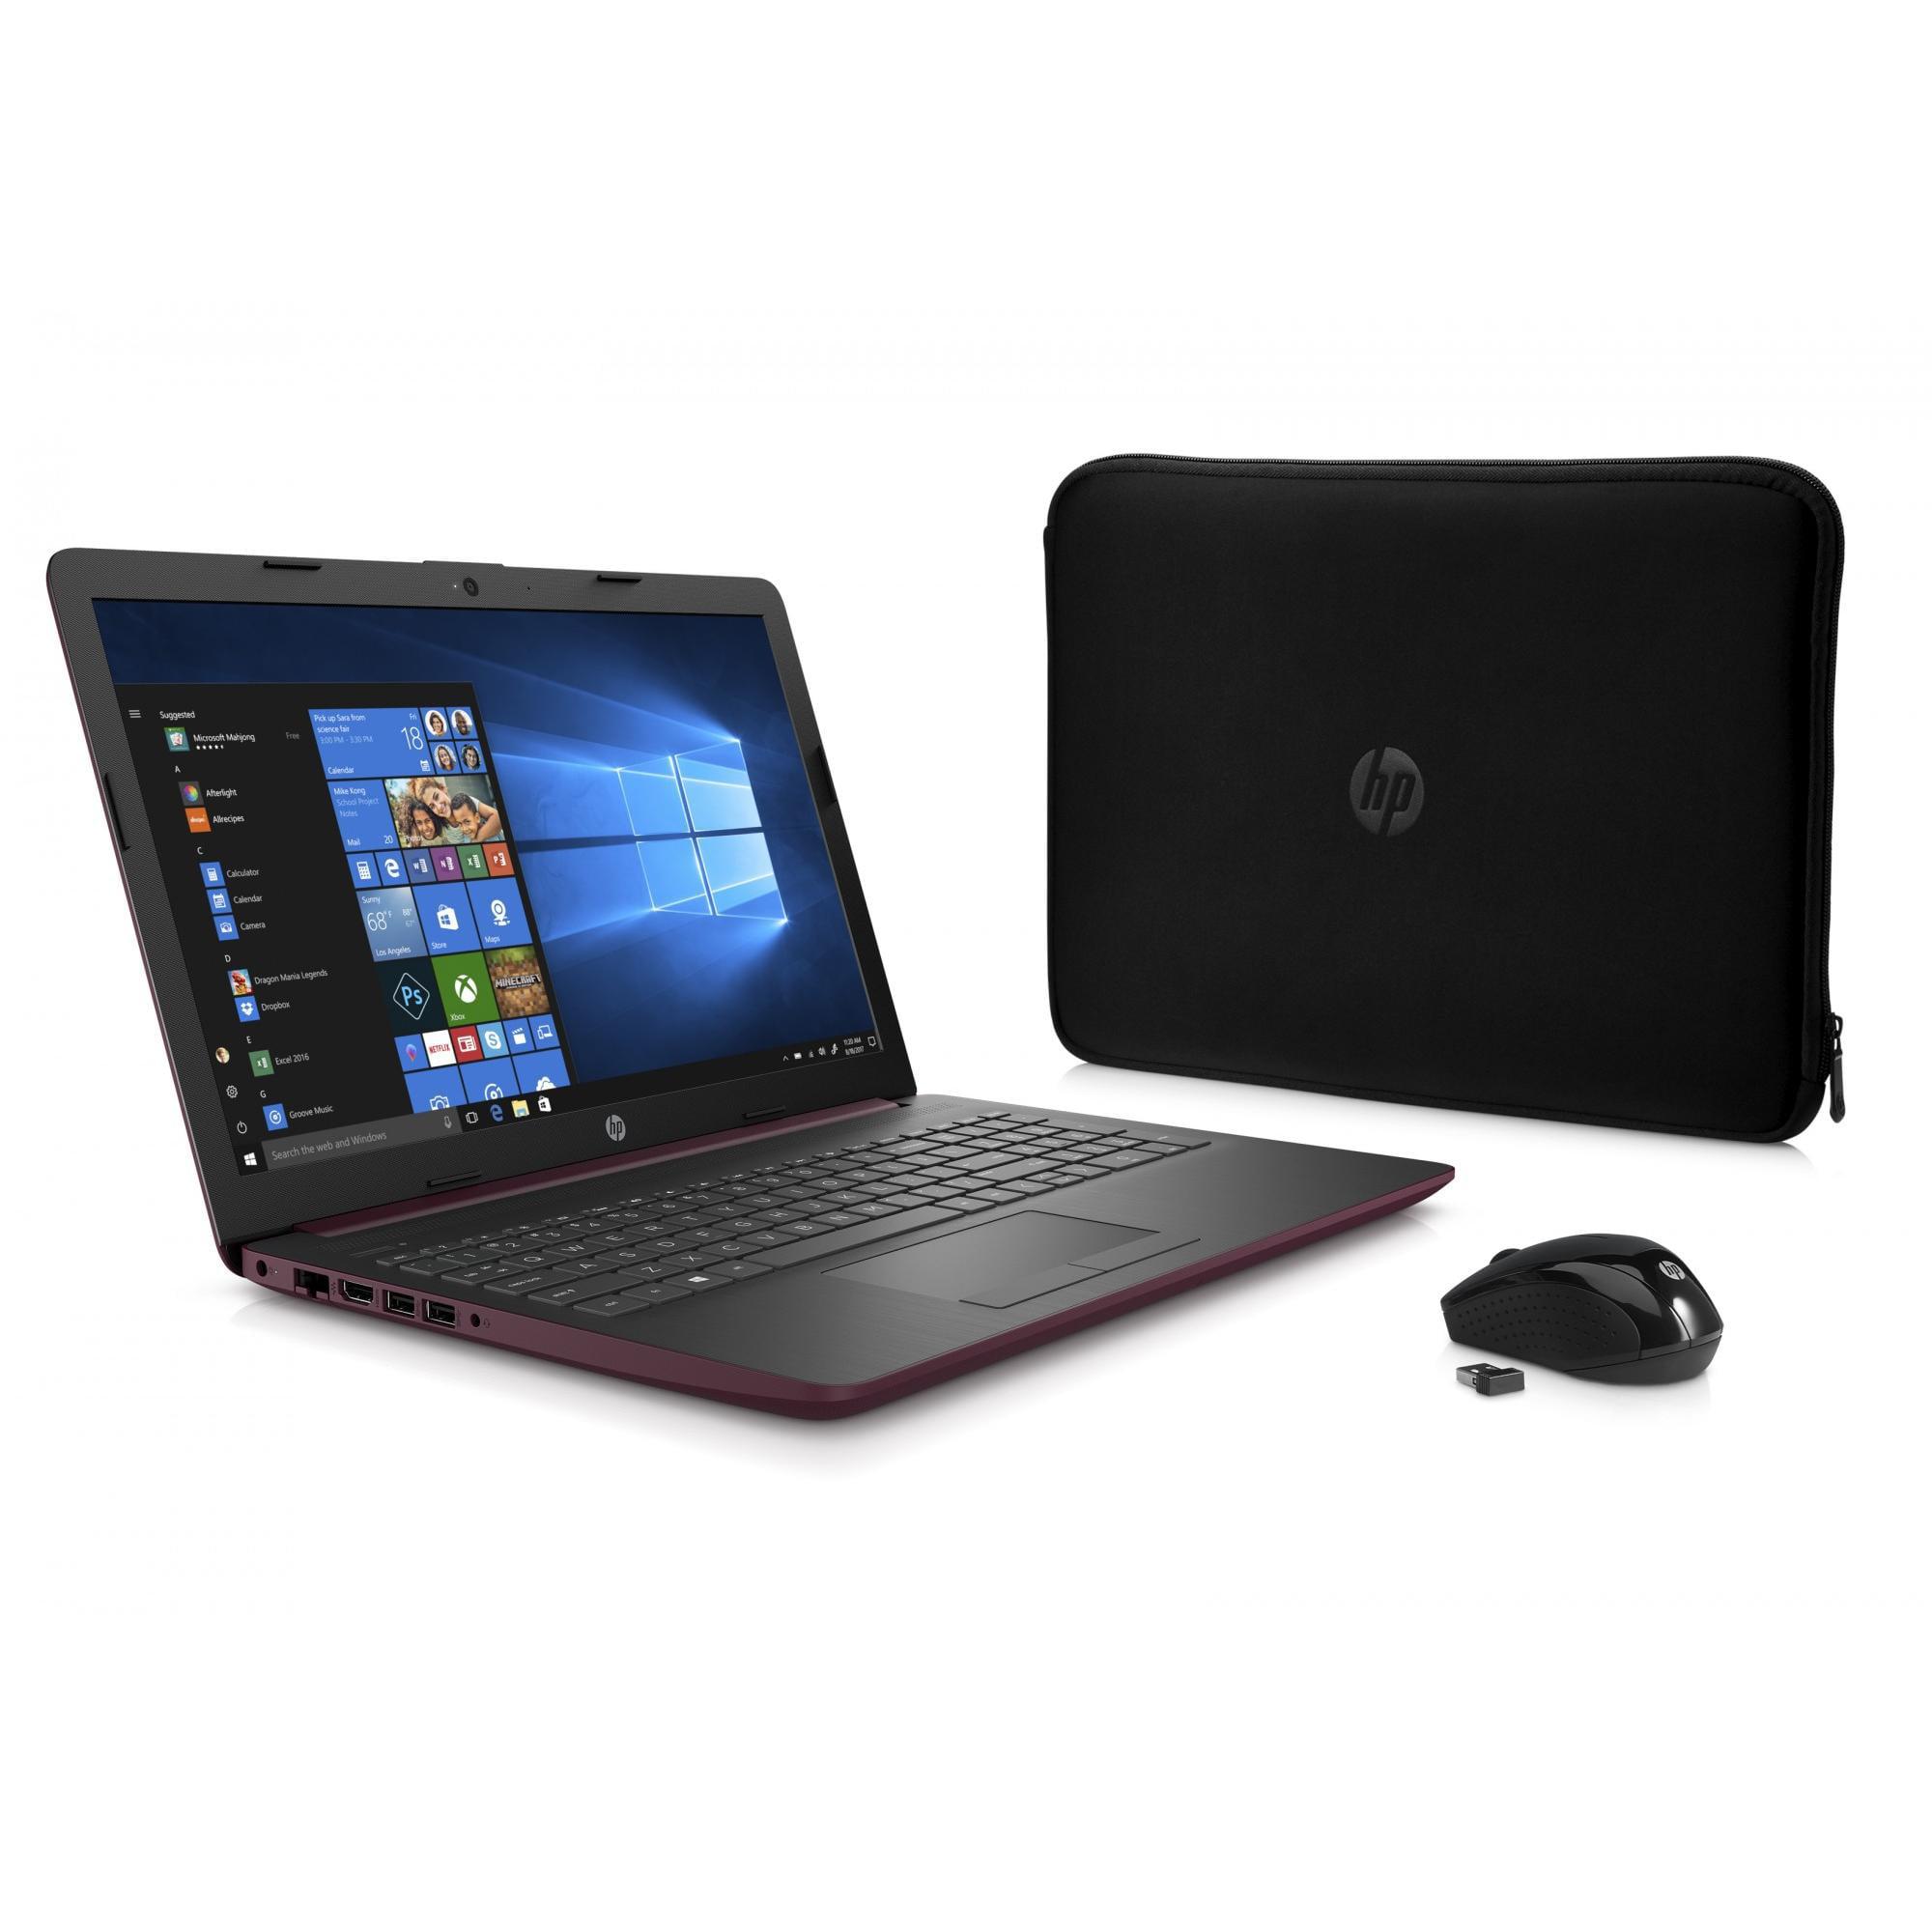 "HP 15 Laptop Bundle 15.6"" , AMD Dual-Core E2-9000e, 500GB HDD, 4GB SDRAM, Windows 10, Wireless Mouse X3000, Neoprene Sleeve - Twilight Blue - 15-db0081wm"